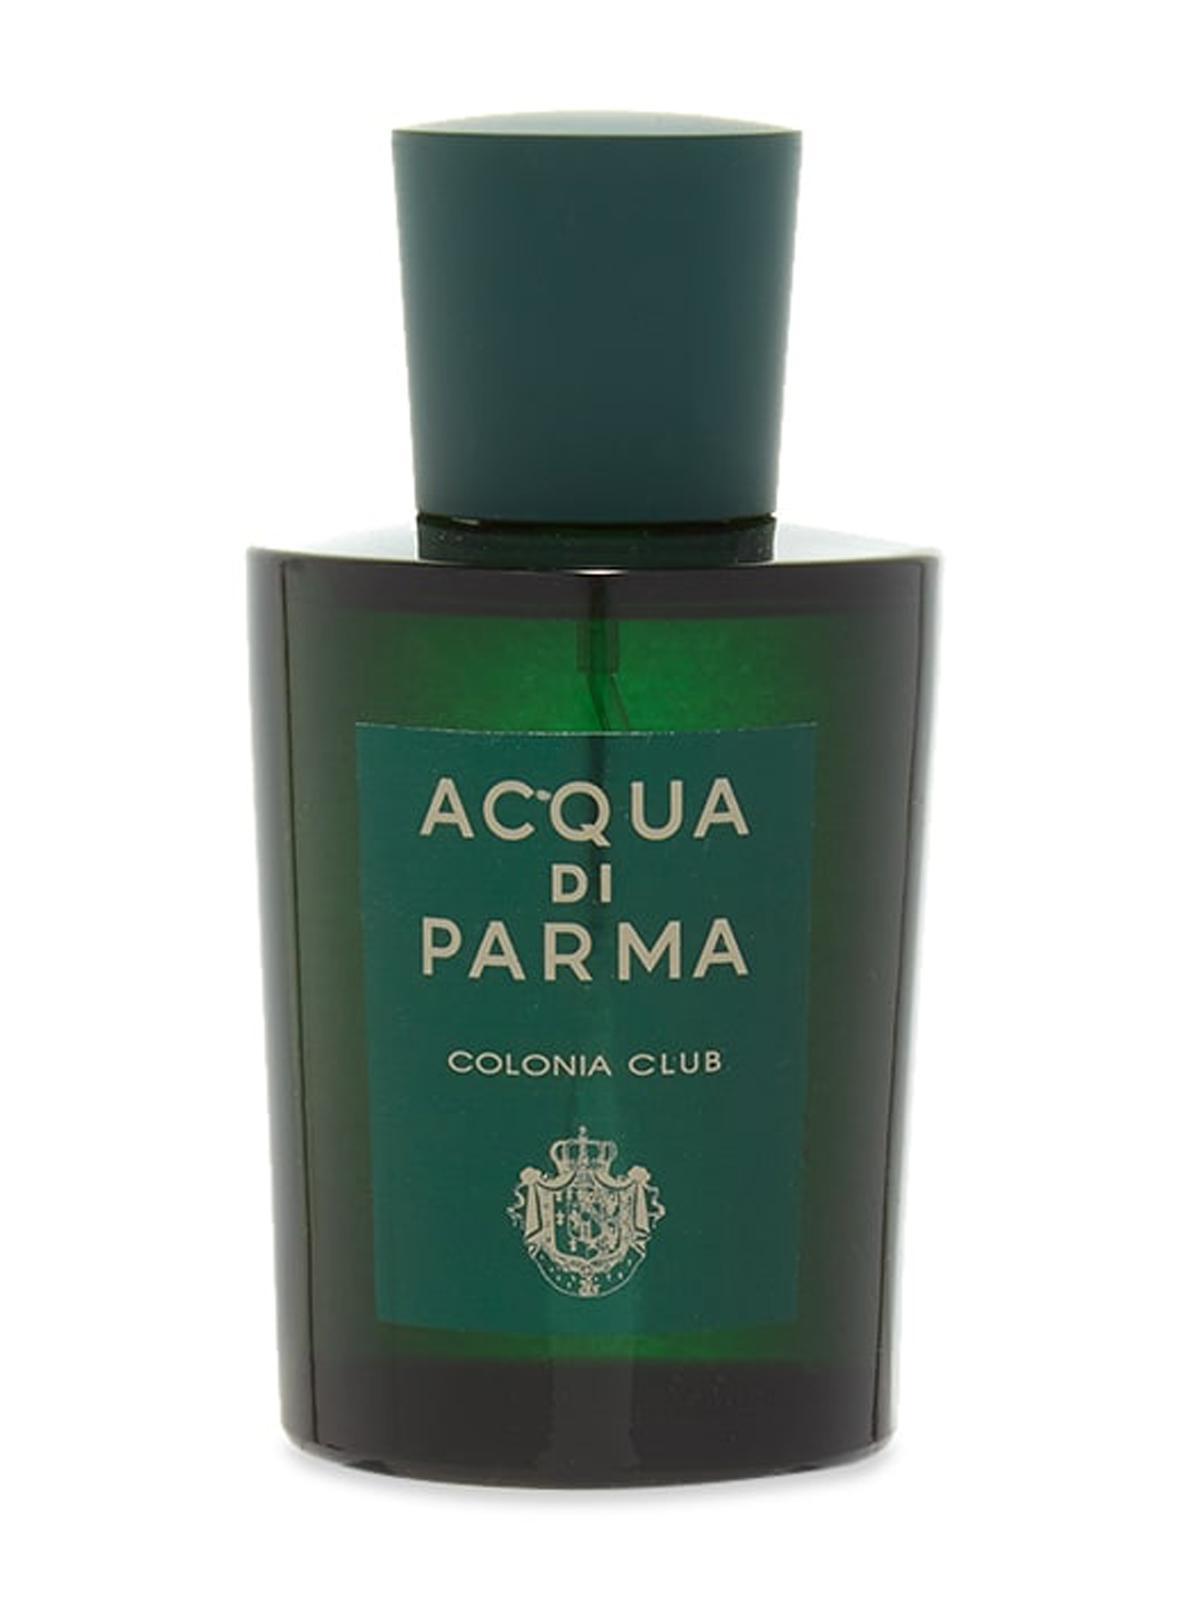 Acqua Di Parma Colonia Club For Unisex Eau De Cologne 100ml